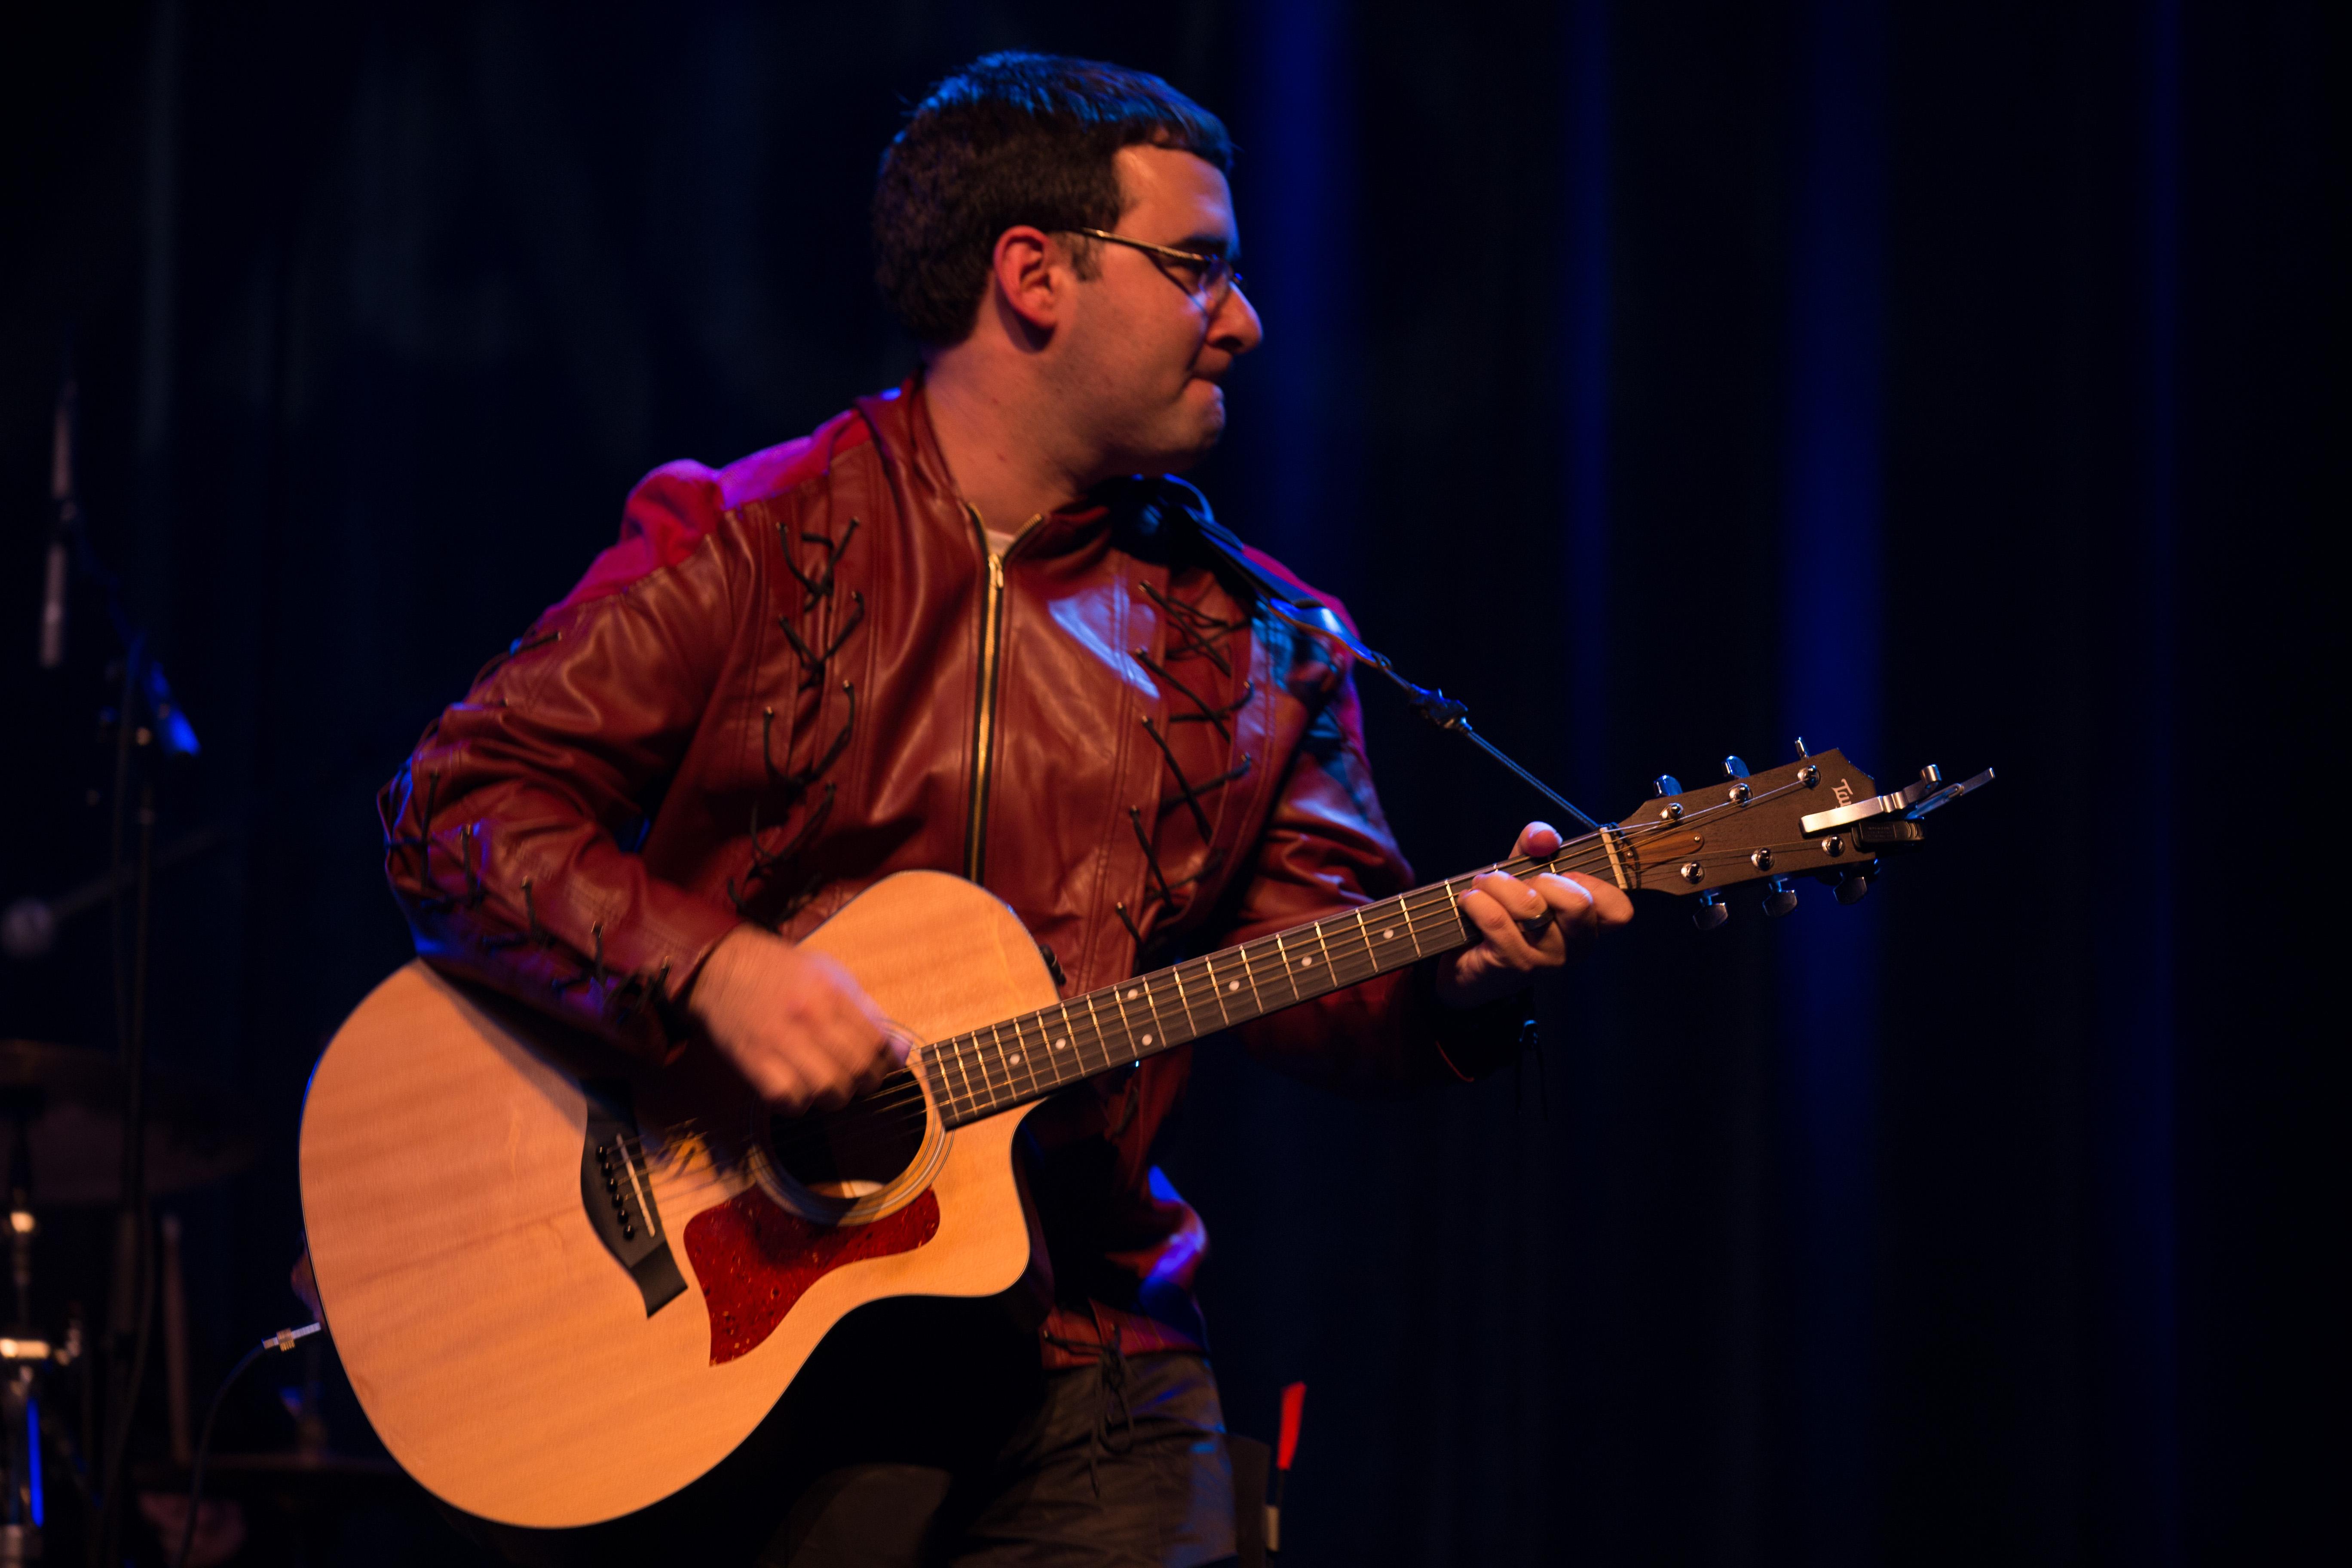 Dave Kitsberg - Youmacon 2015